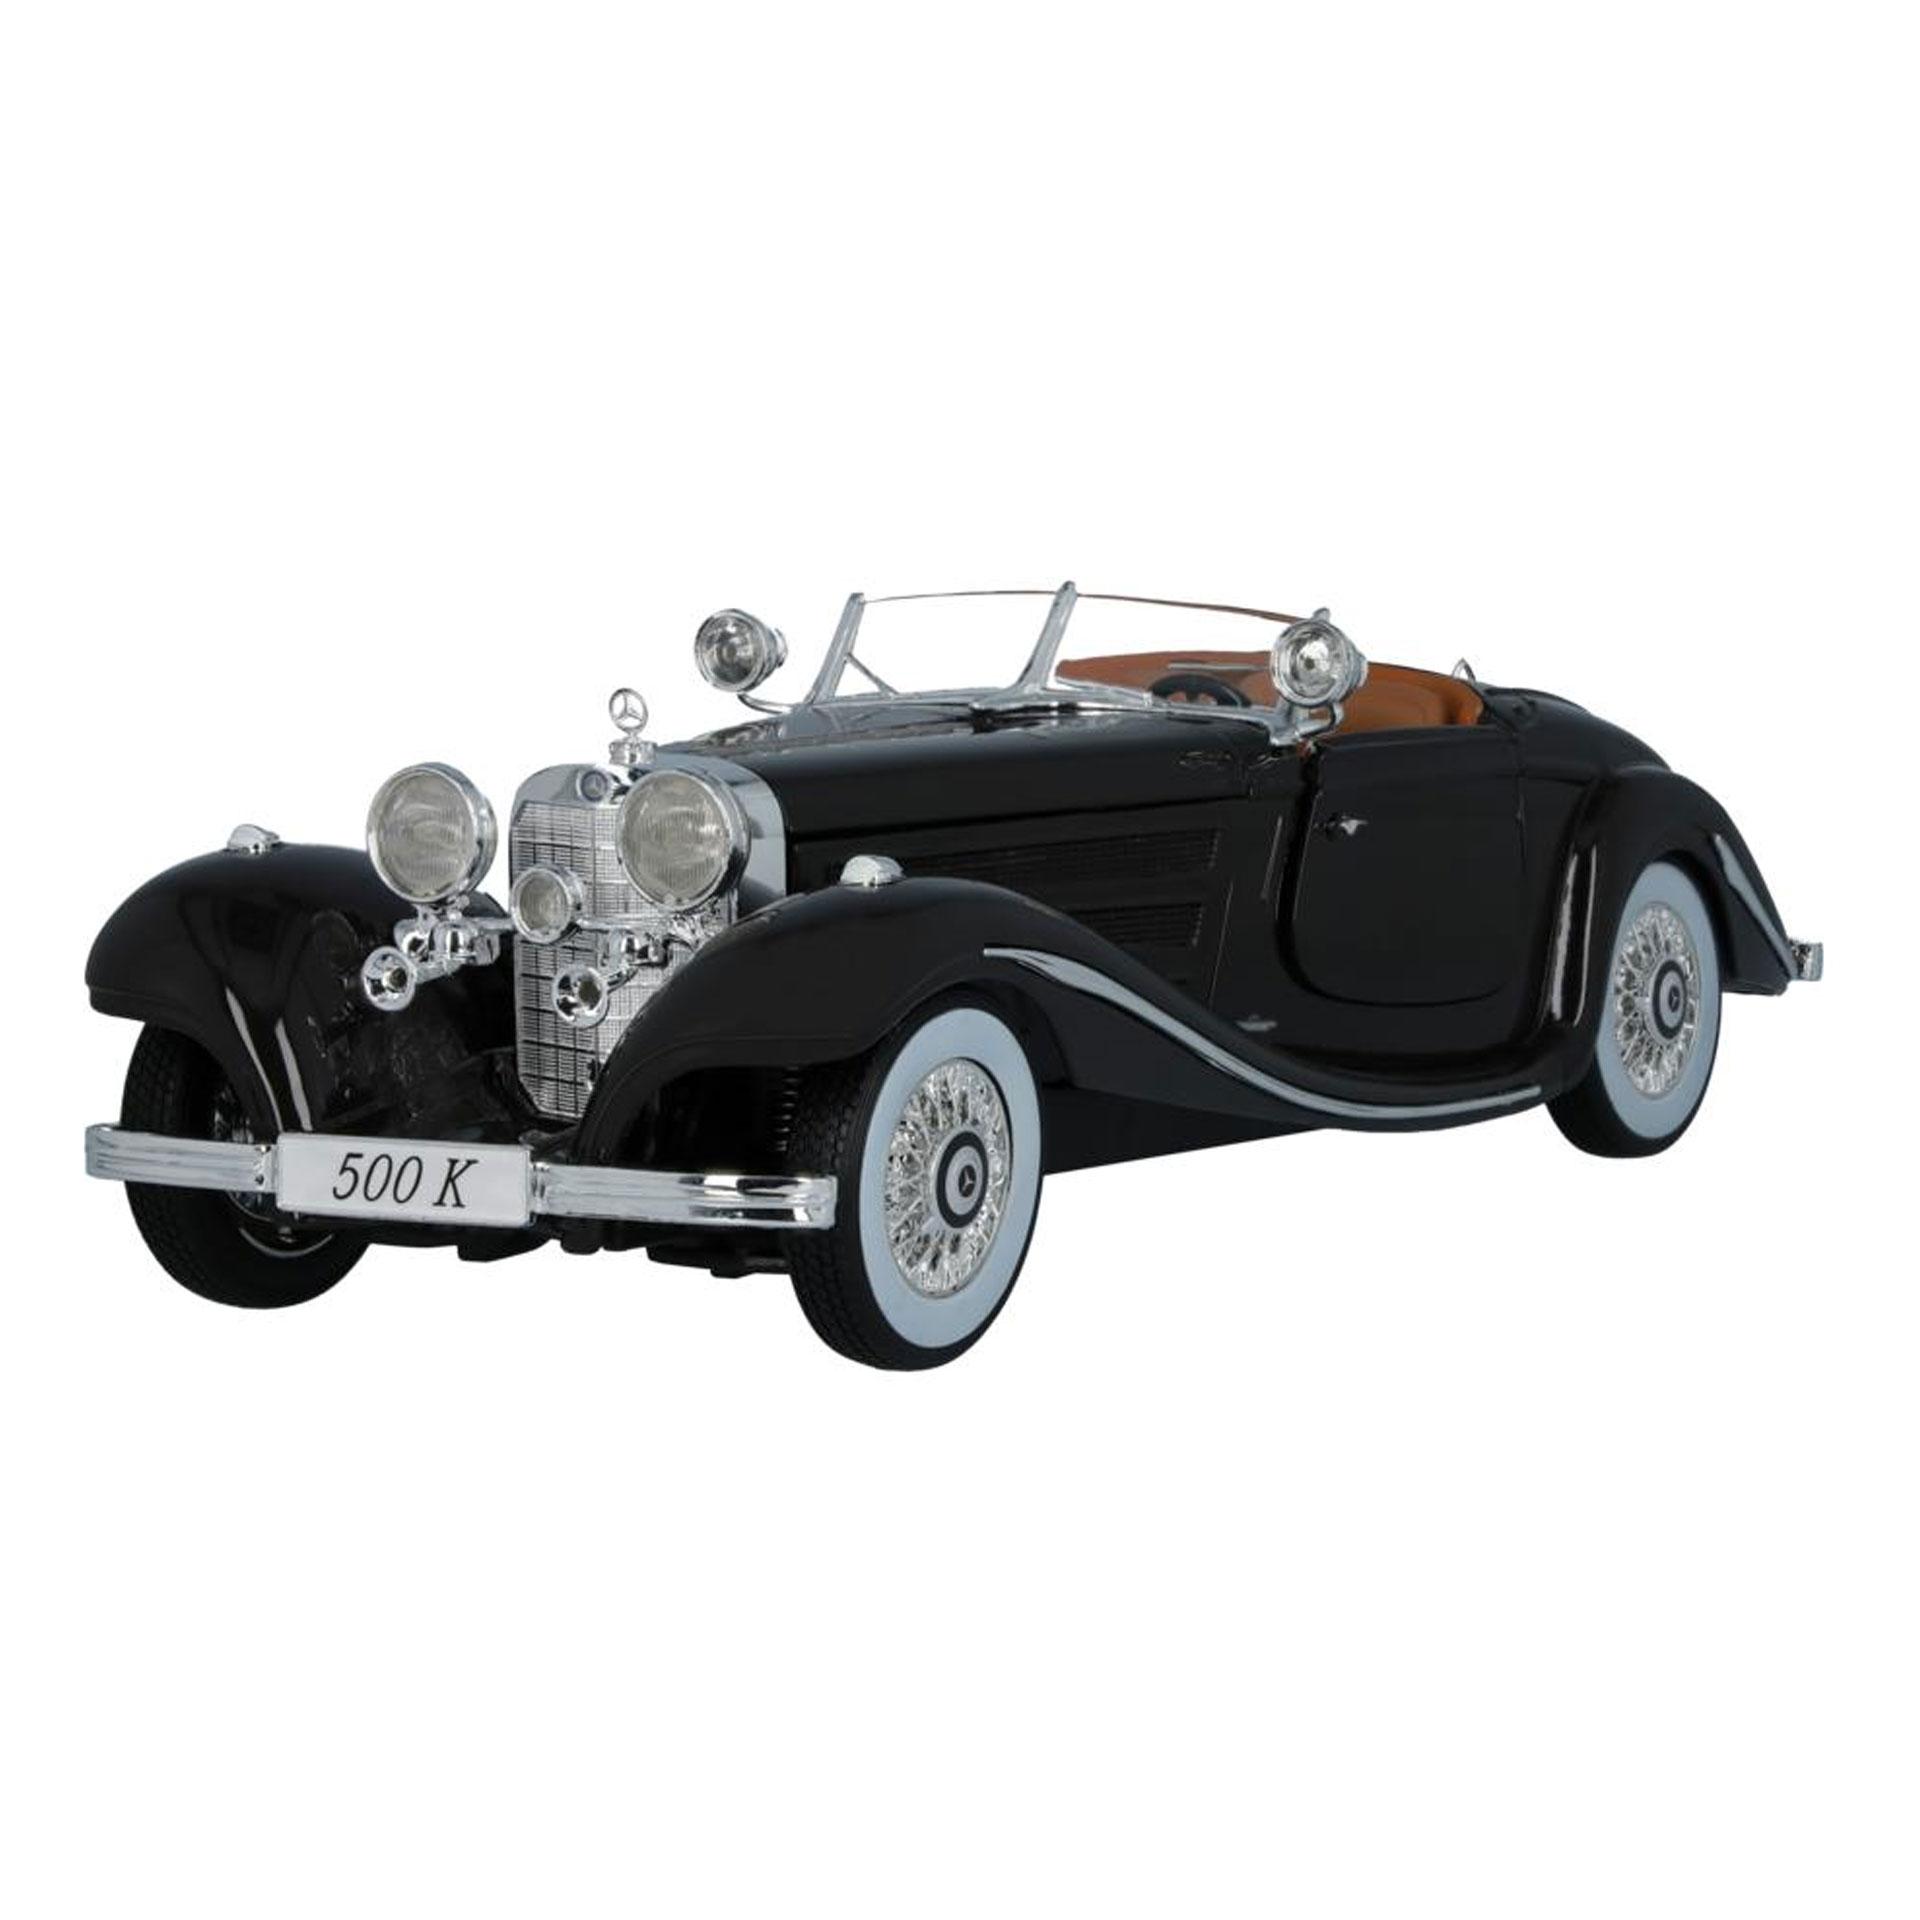 Mercedes-Benz Modellauto 500 K Spezial-Roadster W 29 (1934-1936) 1:18